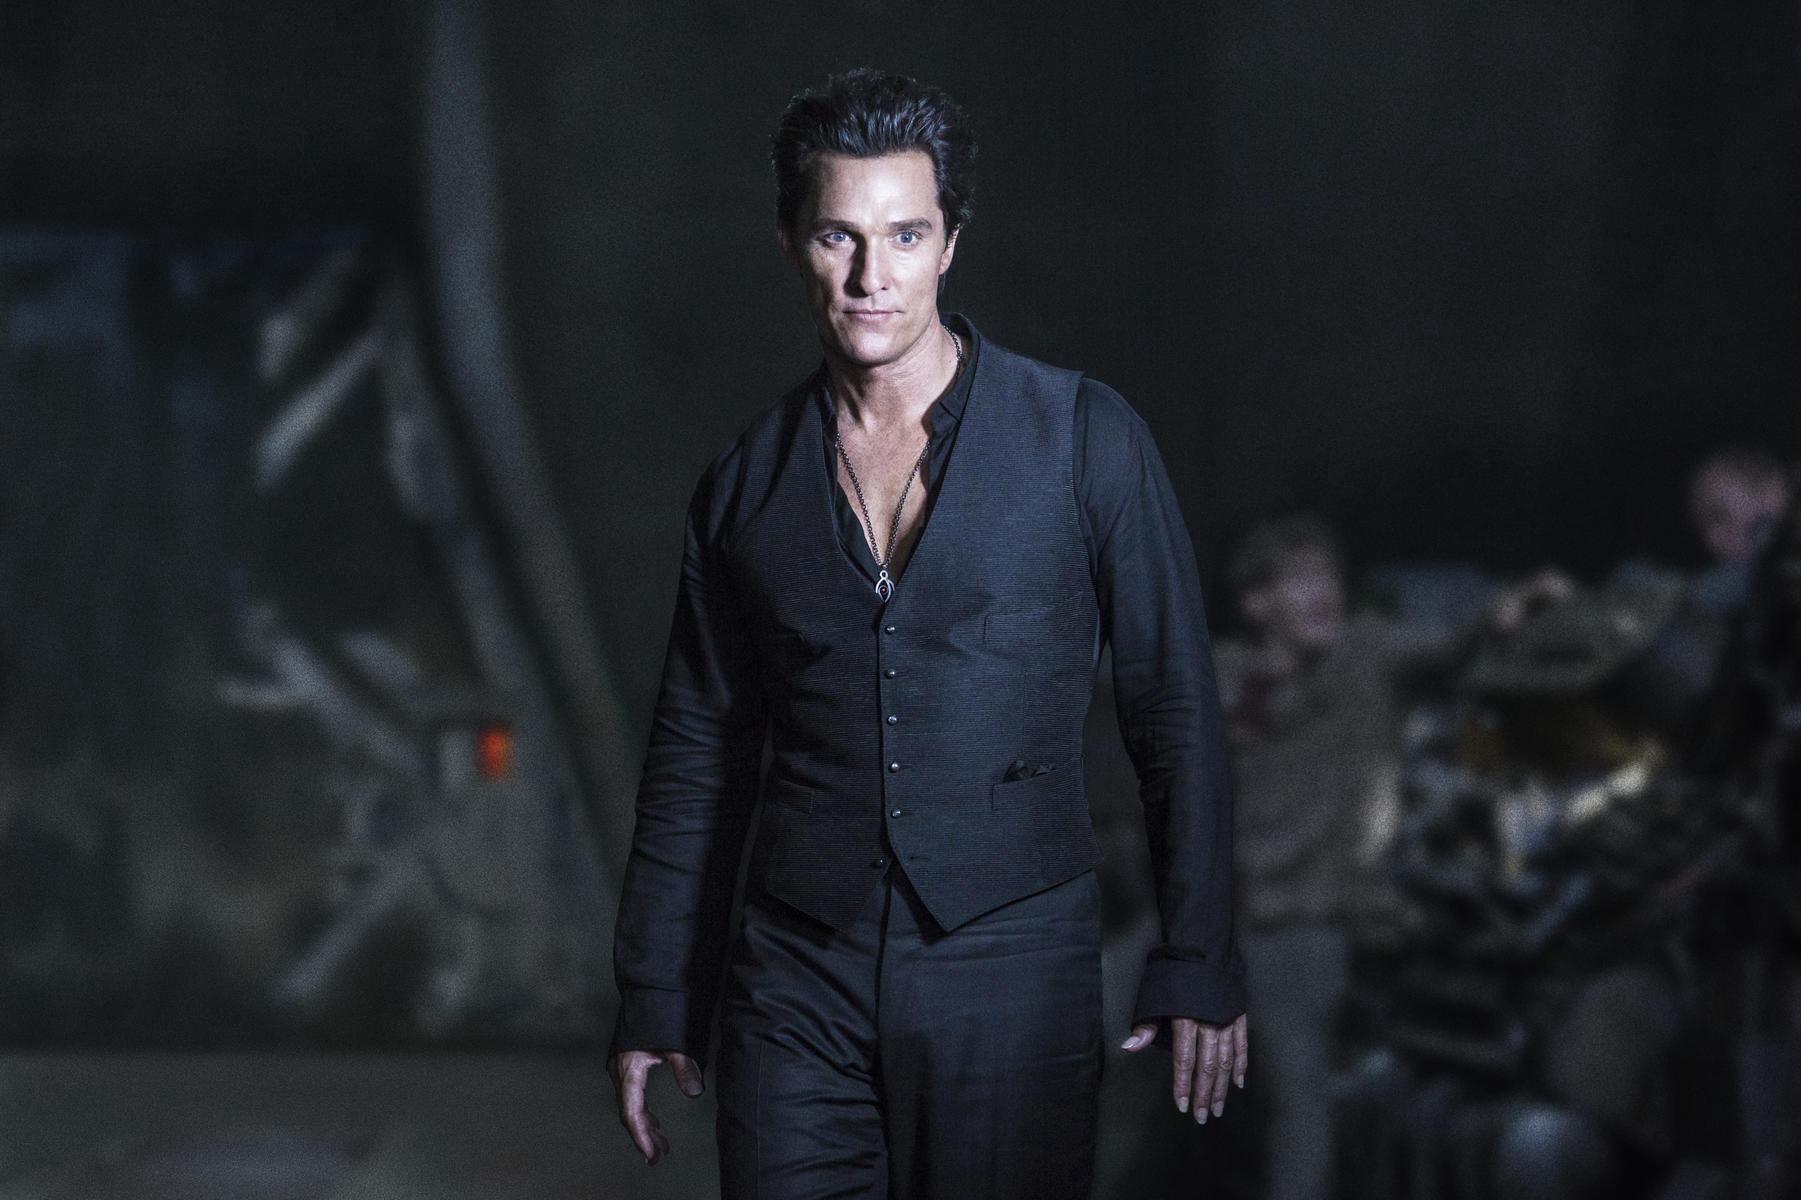 Matthew McConaughey as Walter Padick, The Man in Black in The Dark Tower (2017)